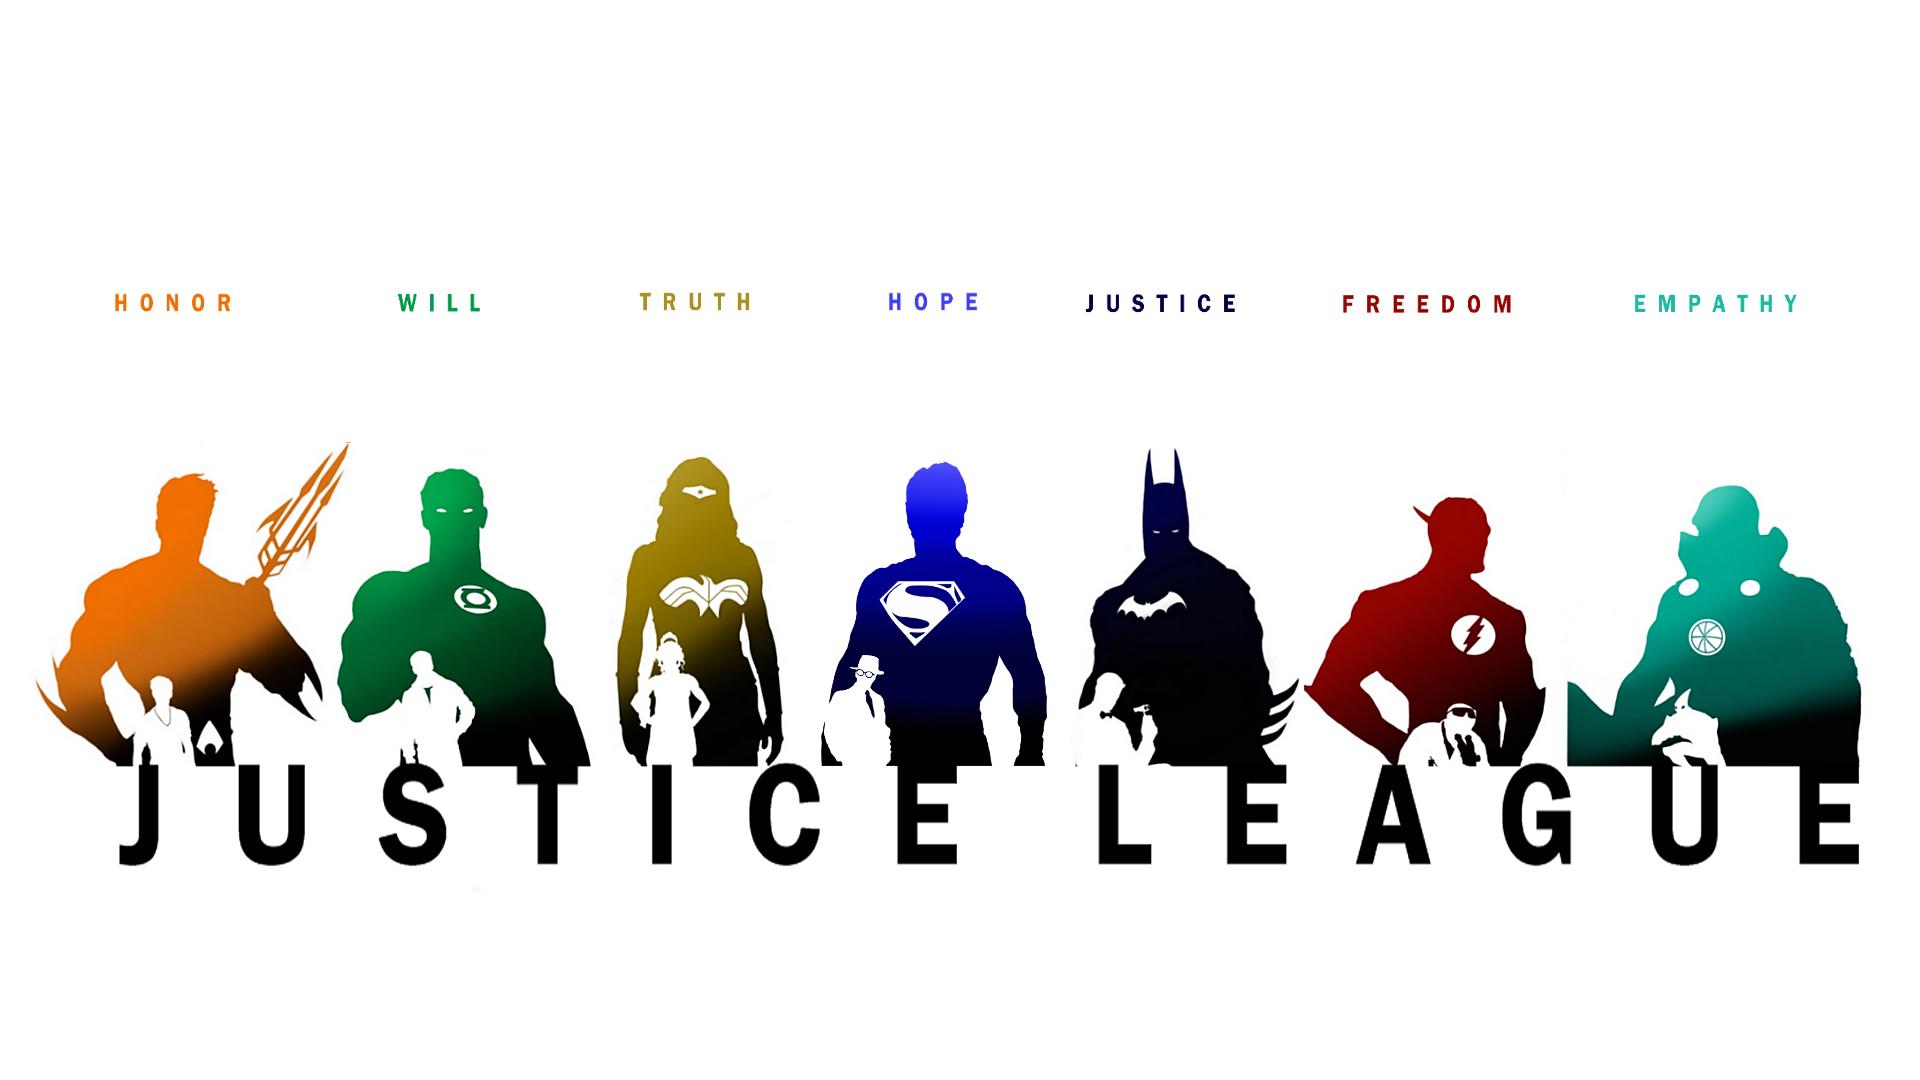 General 1920x1080 DC Comics superhero Justice League Wonder Woman Batman Begins Superman Man of Steel Flash Green Lantern Aquaman Martian Manhunter